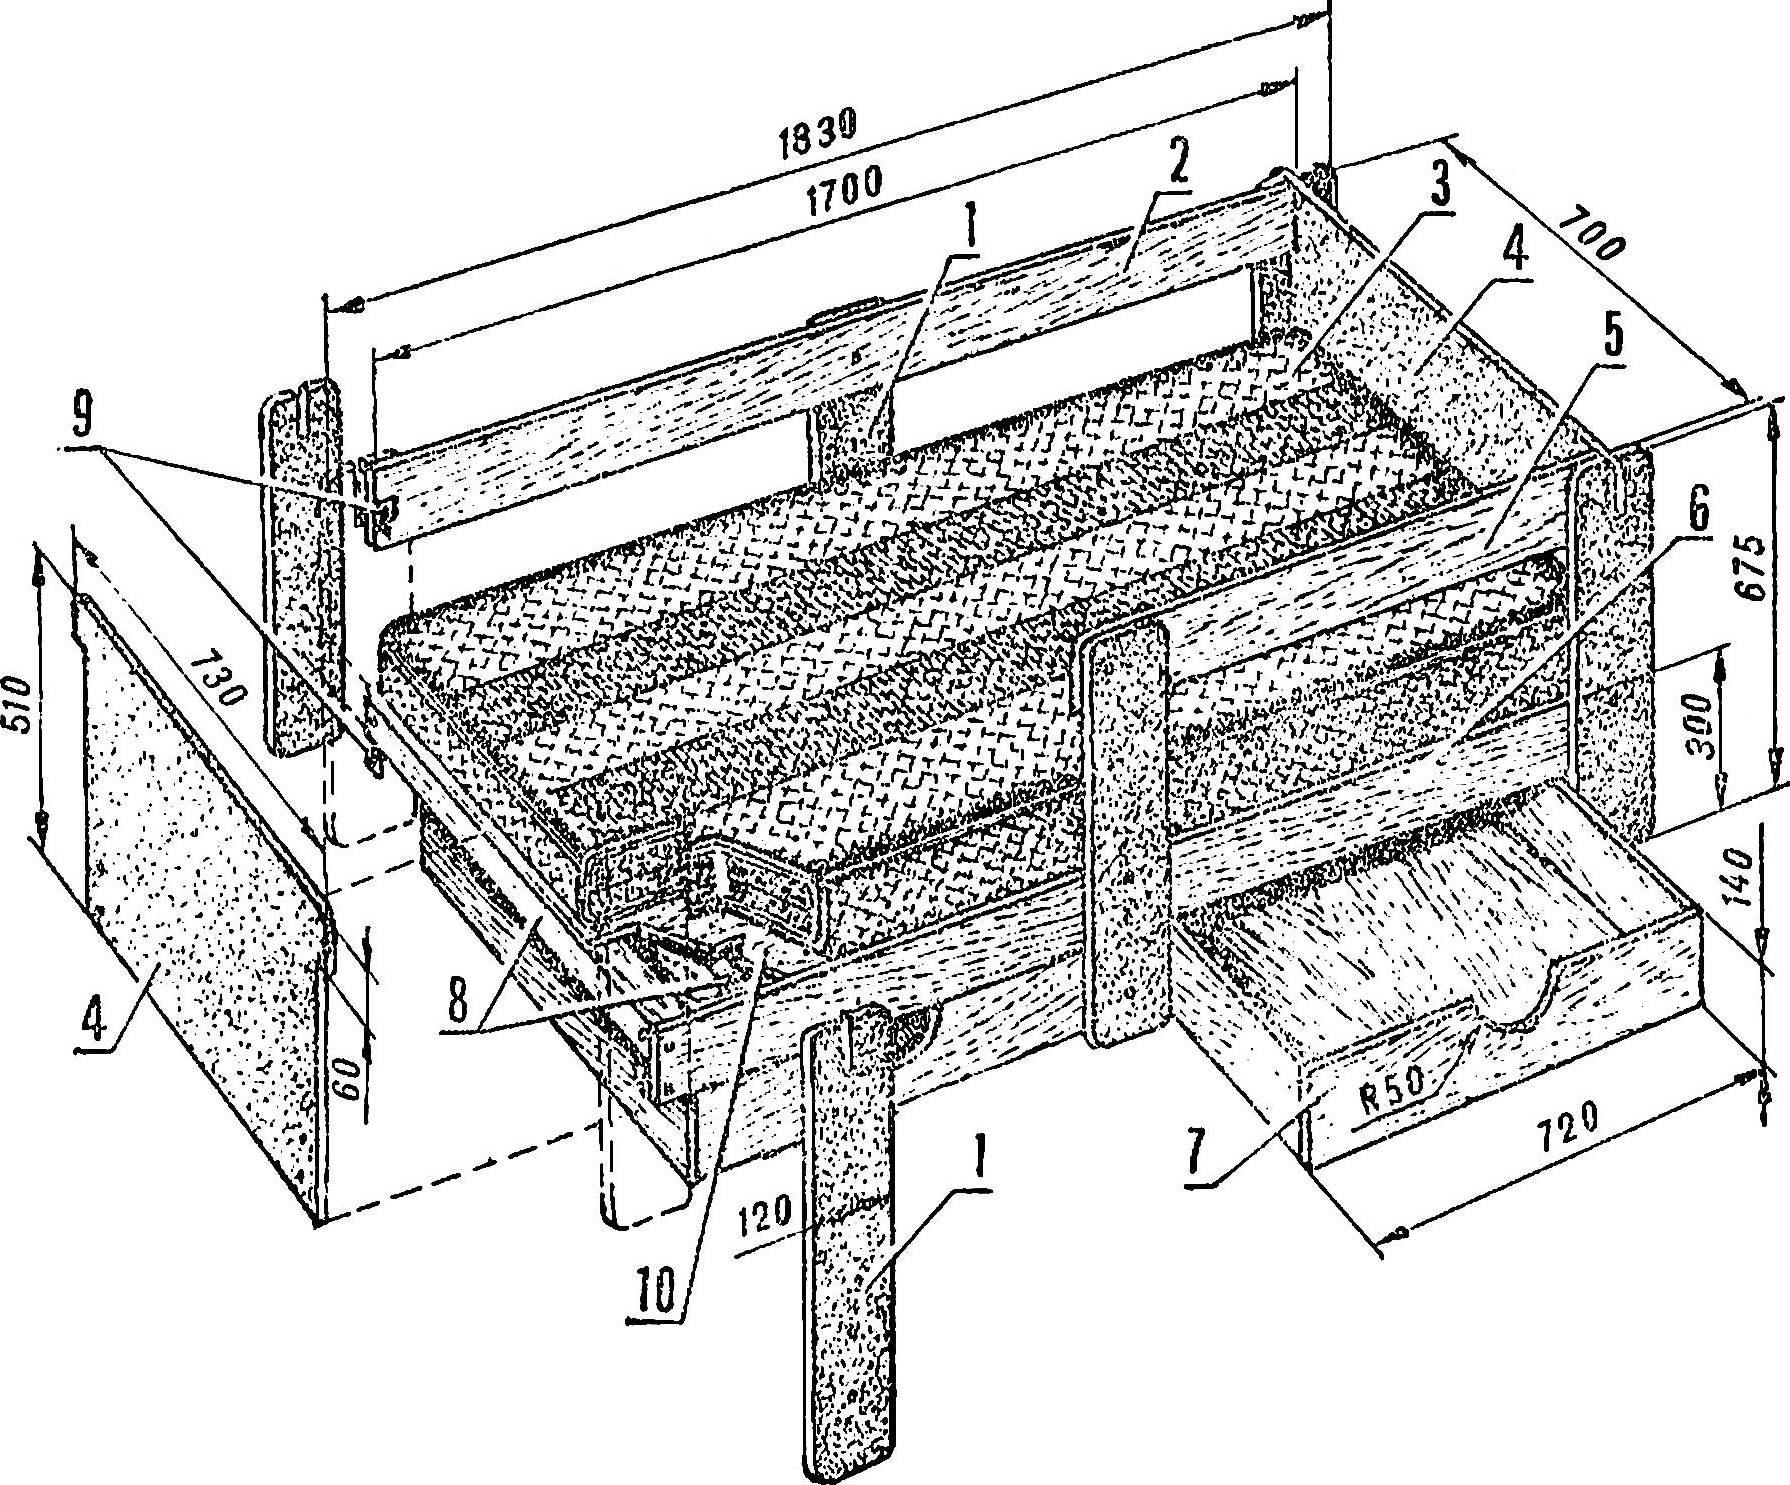 Fig. 5. Bed.